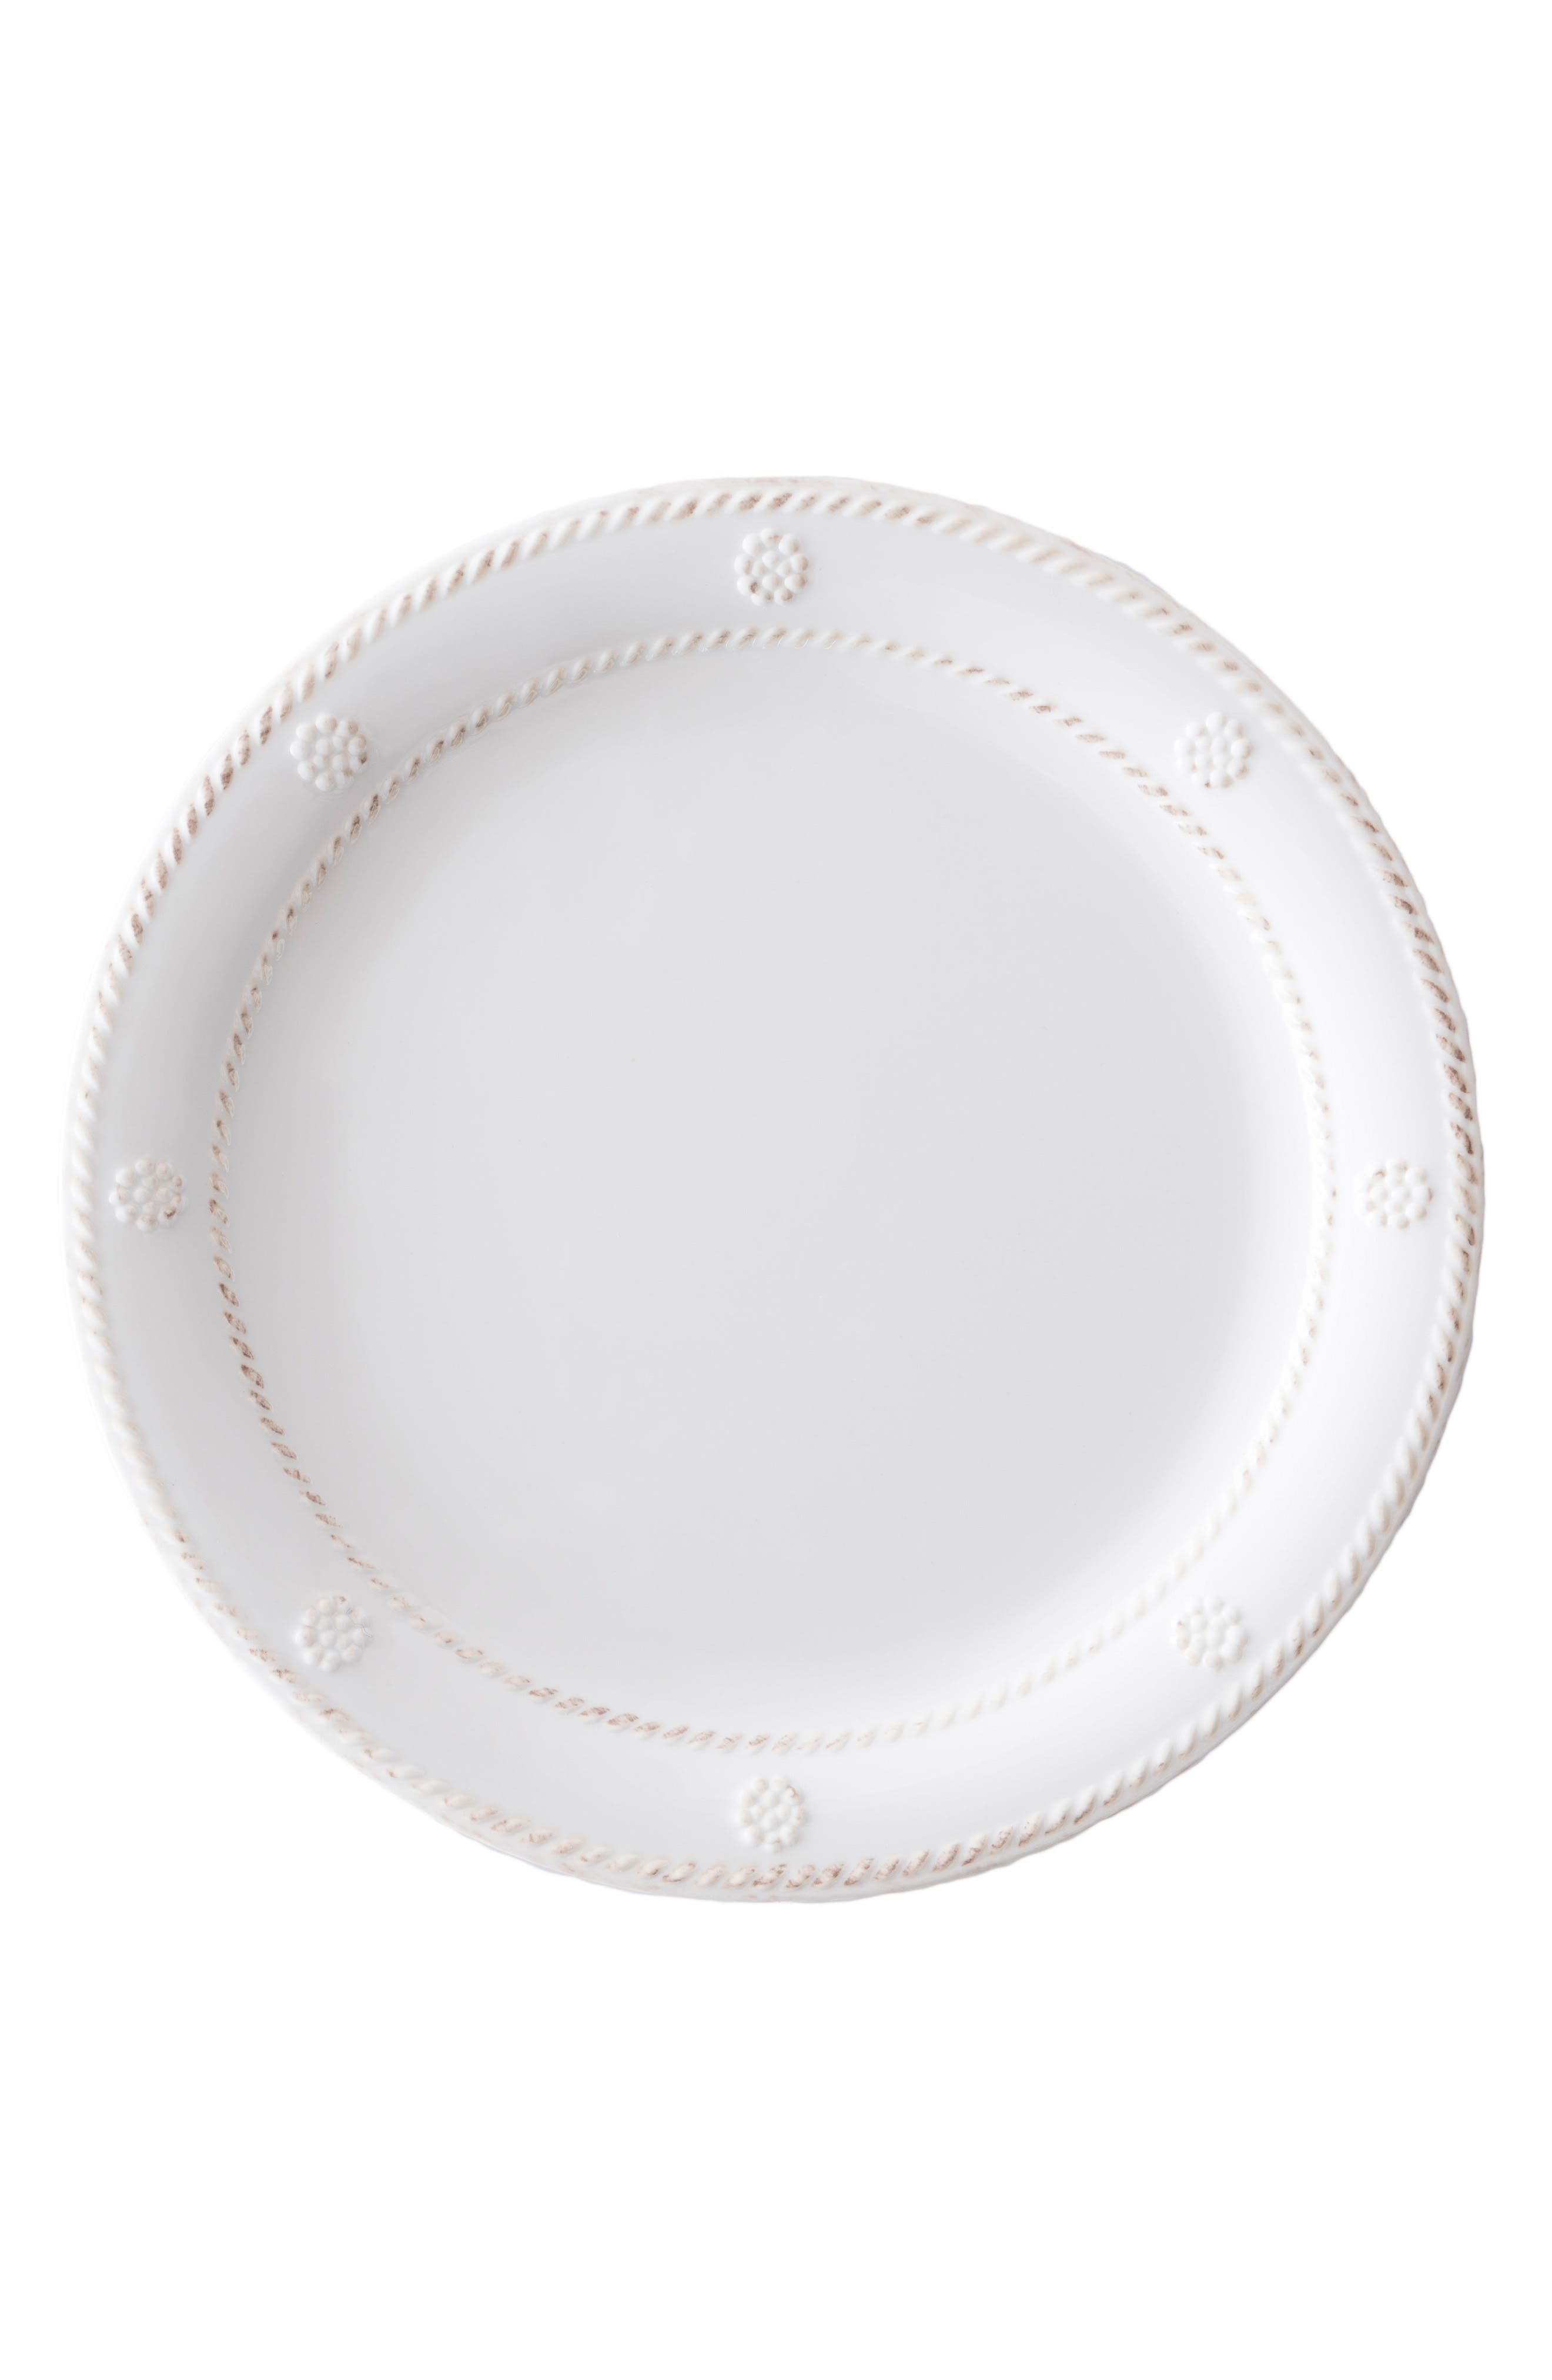 Berry & Thread Melamine Dessert Plate,                         Main,                         color, 100